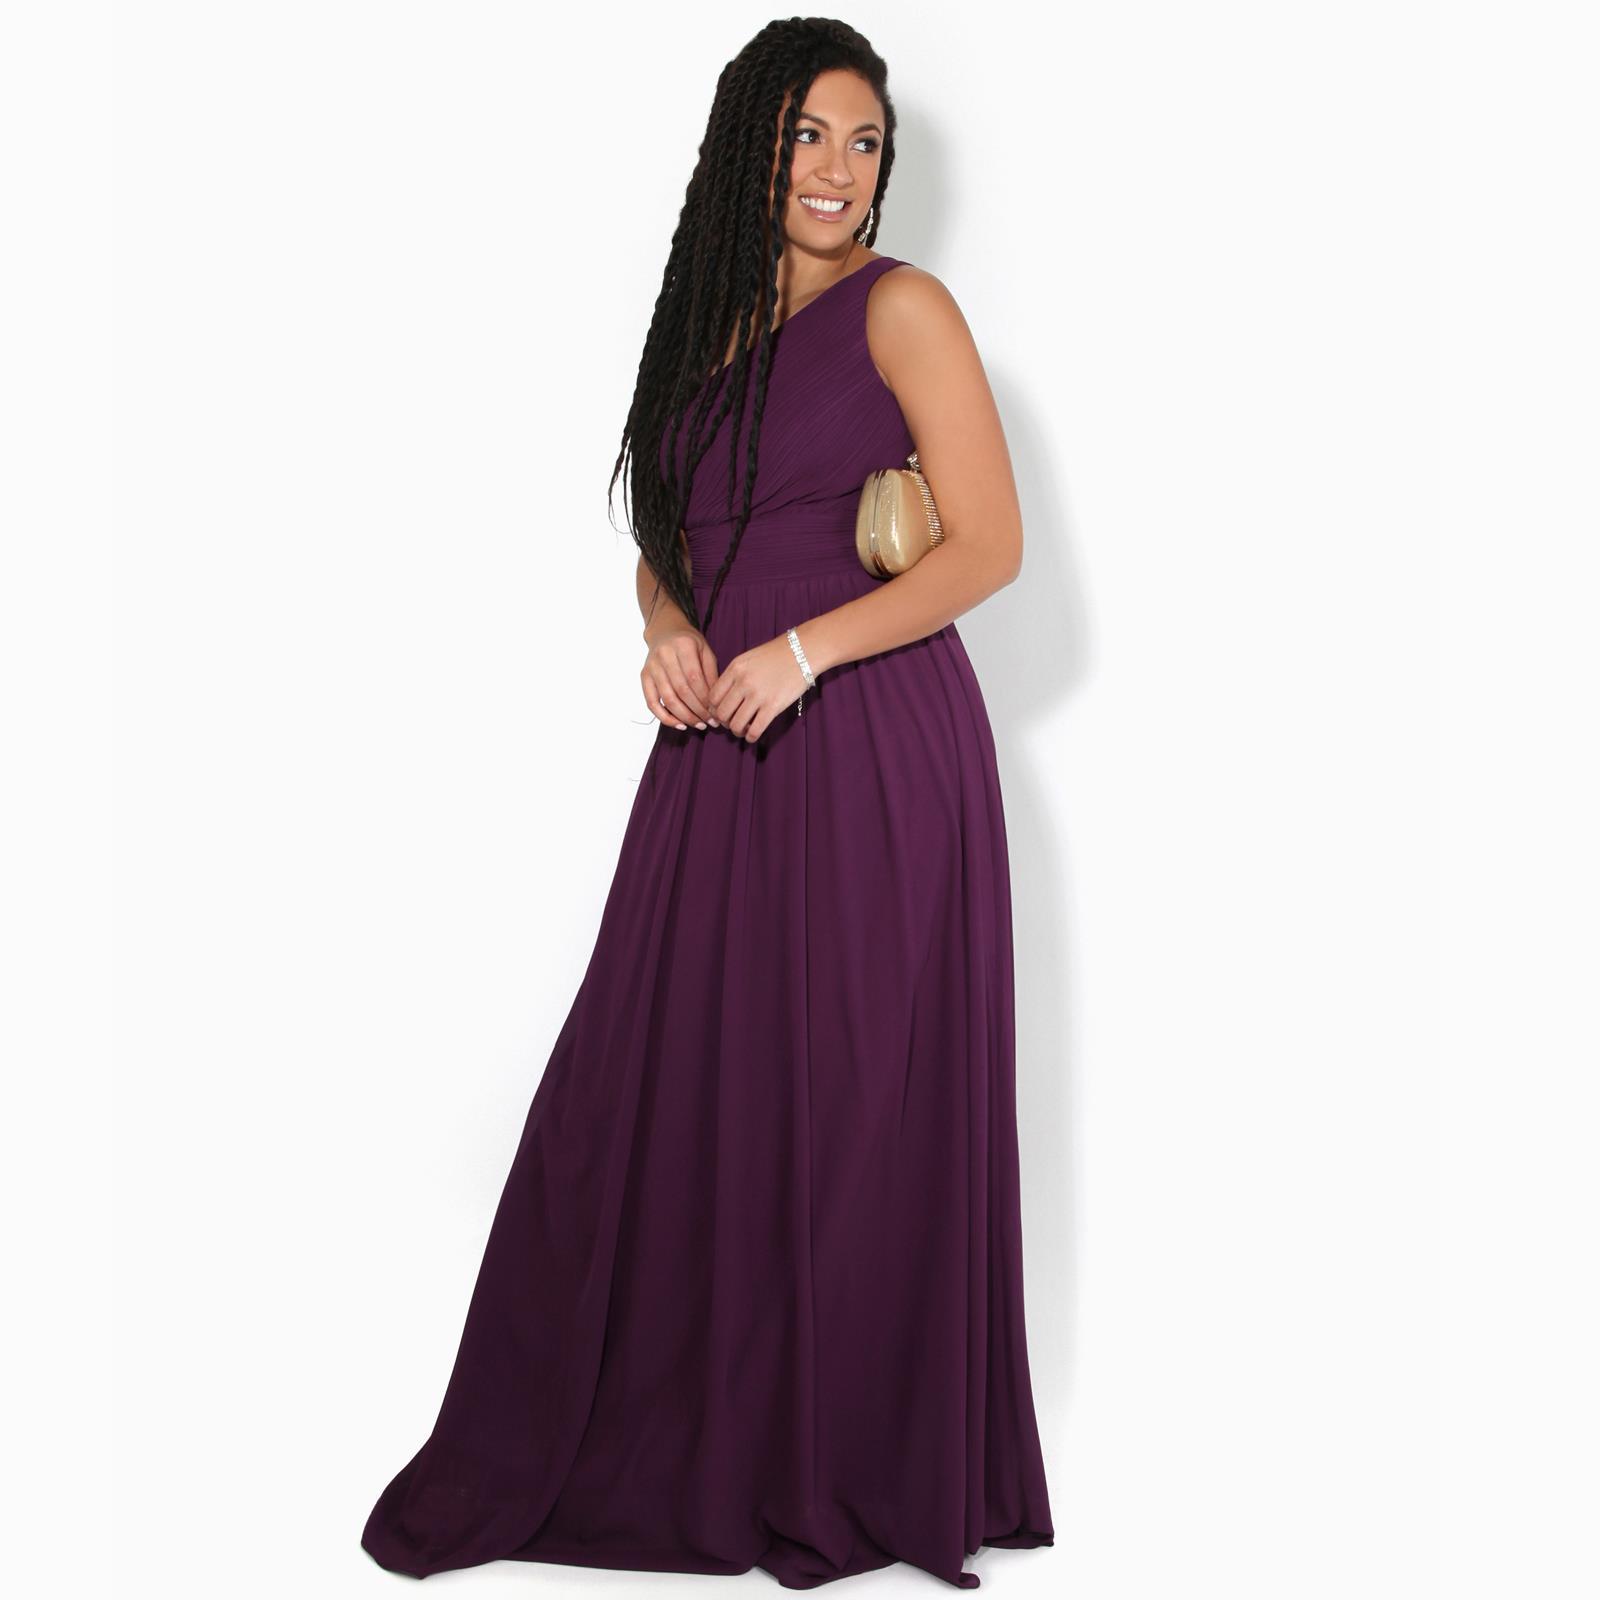 Womens-Wedding-Bridesmaid-Prom-Dress-Formal-One-Off-Shoulder-Long-Evening-8-18 thumbnail 9